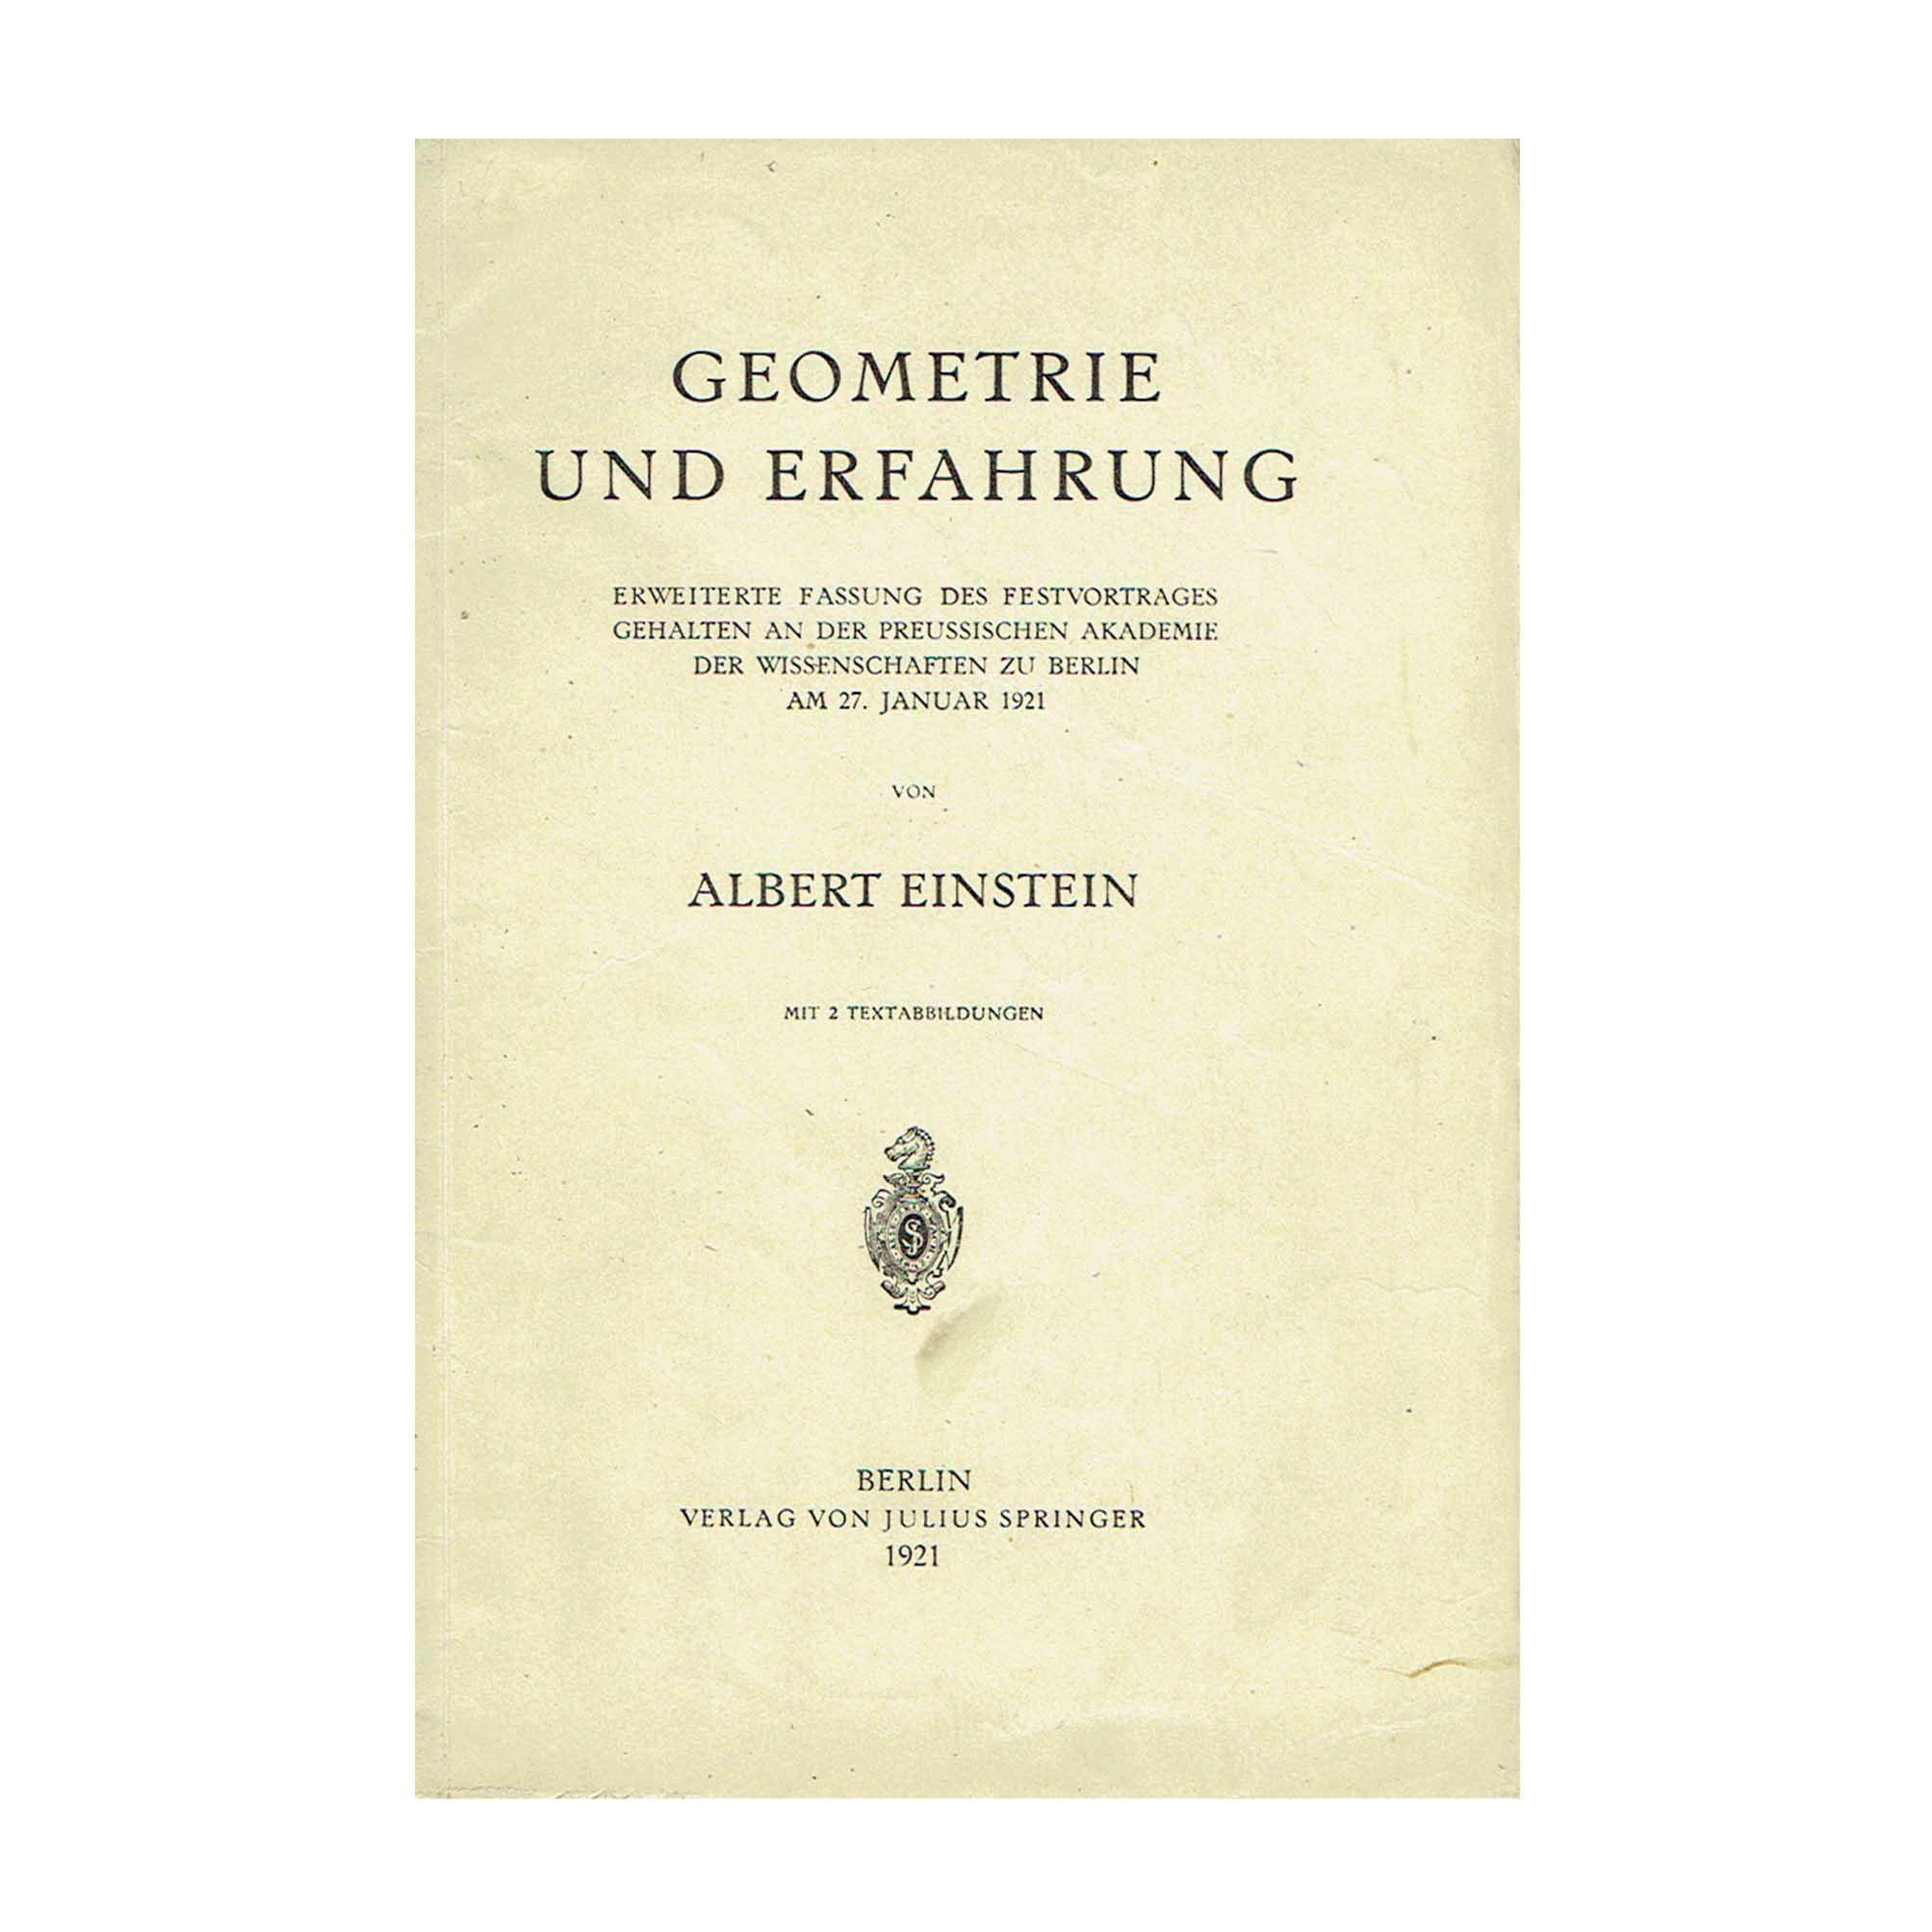 5725-Einstein-Geometrie-1921-Cover-recto-N.jpeg